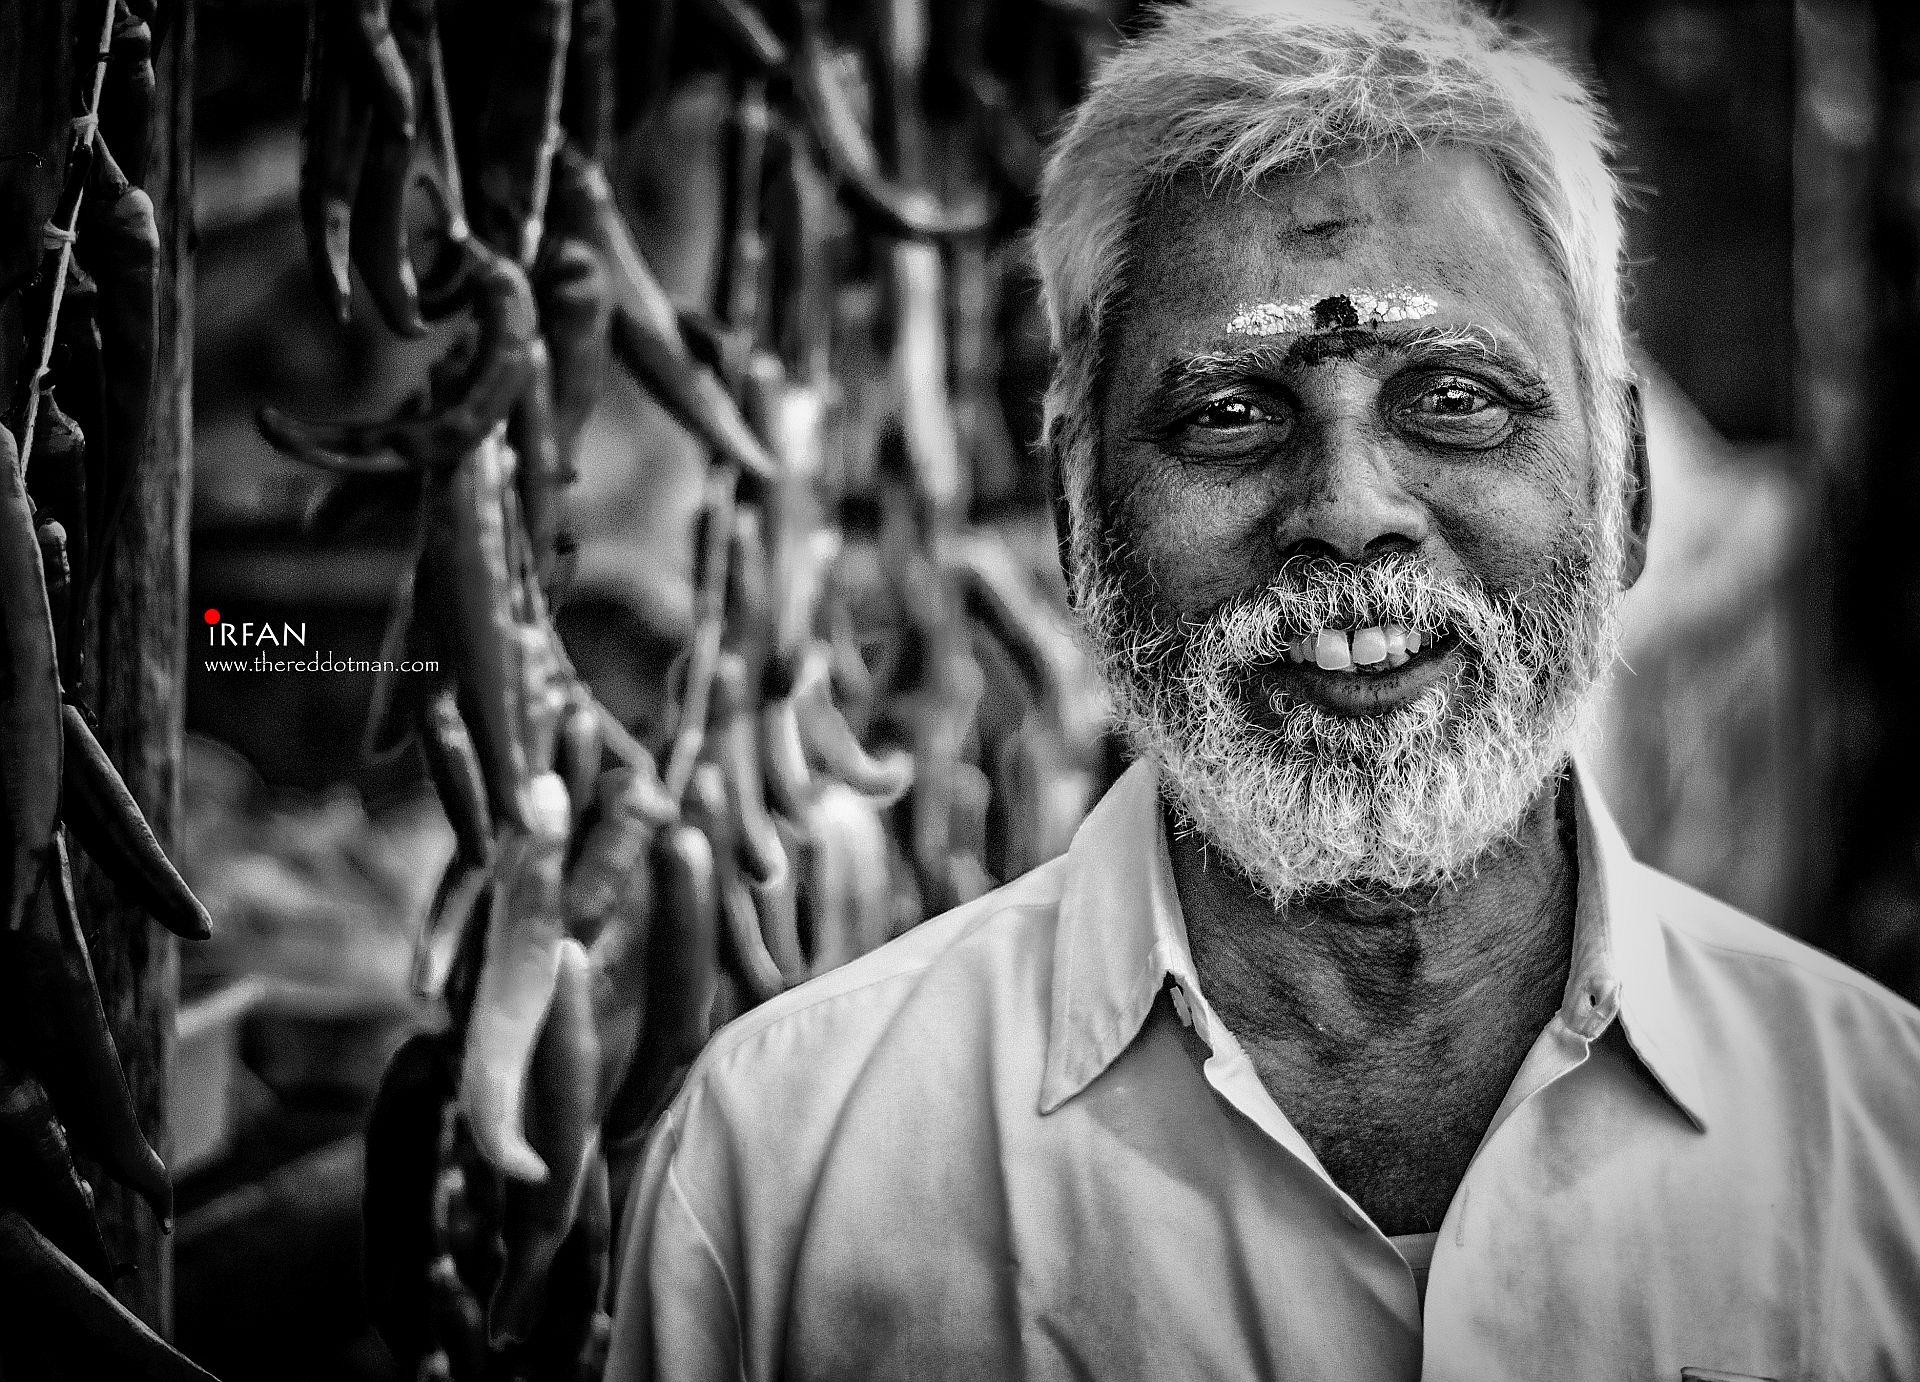 bajji wala, besant nagar, beach, black and white, portraits, irfan hussain, thereddotman, irfan, hussain